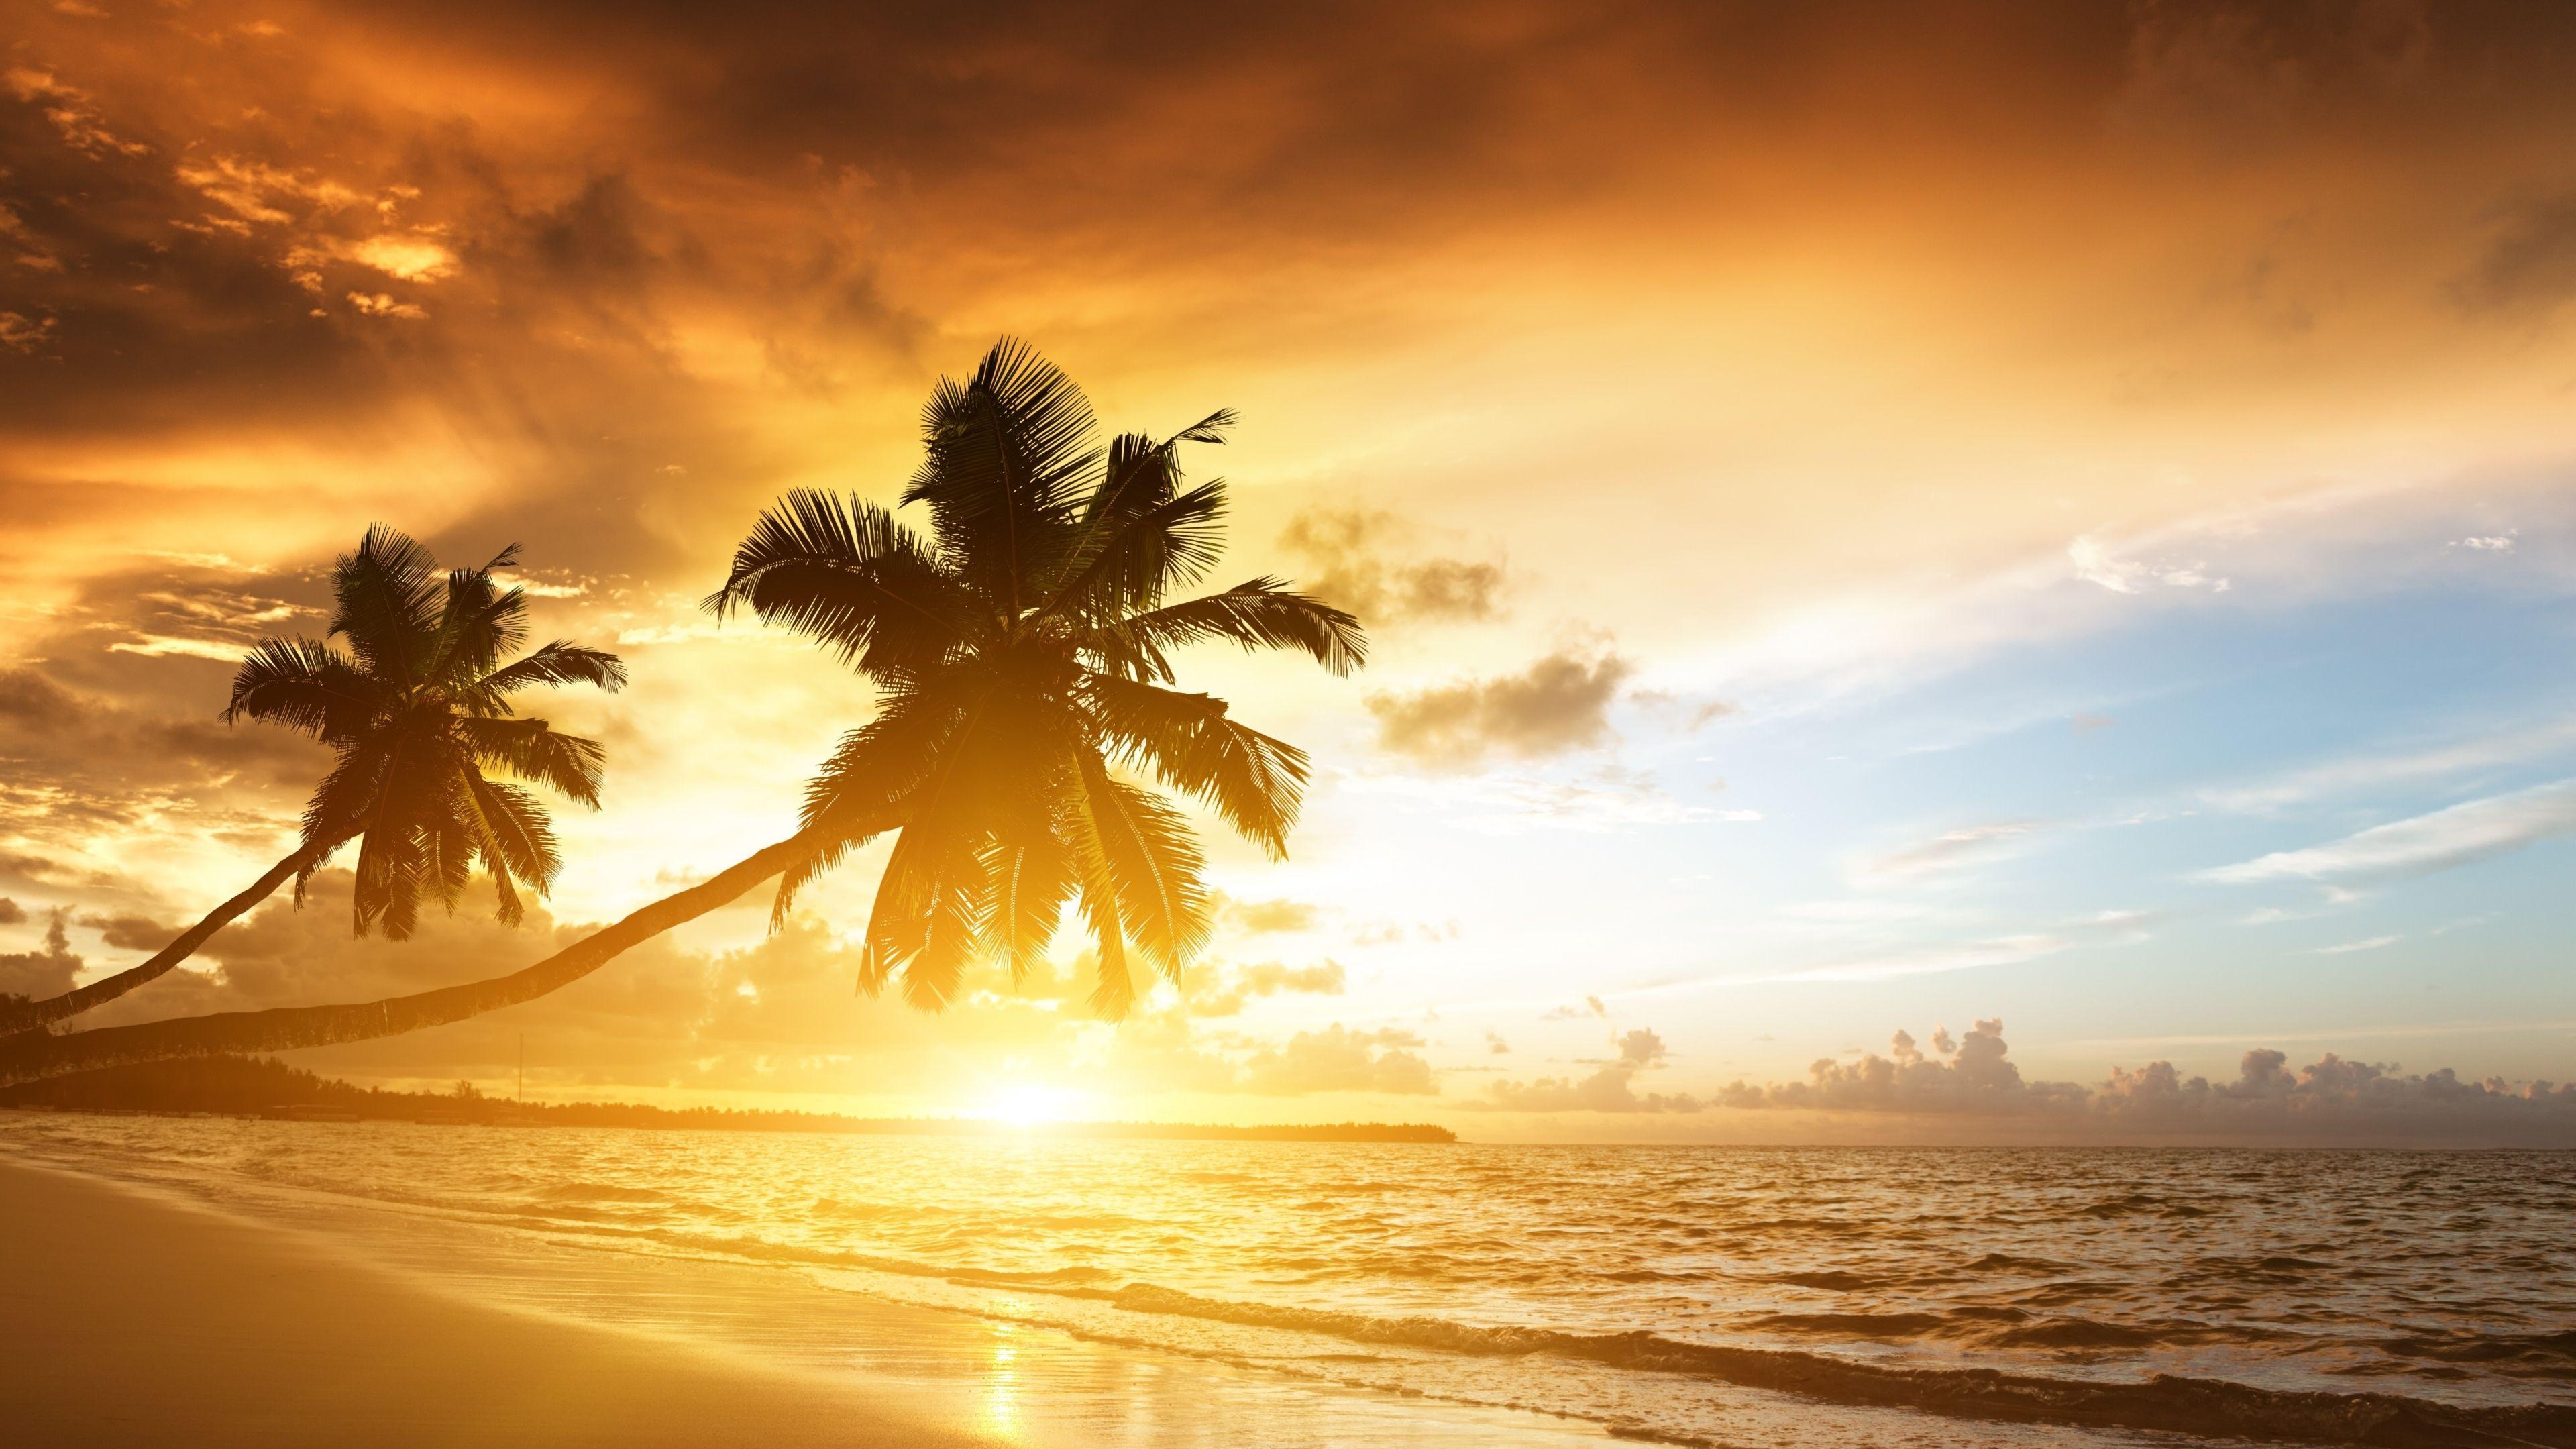 4k Ultra Hd Beach Wallpapers Top Free 4k Ultra Hd Beach